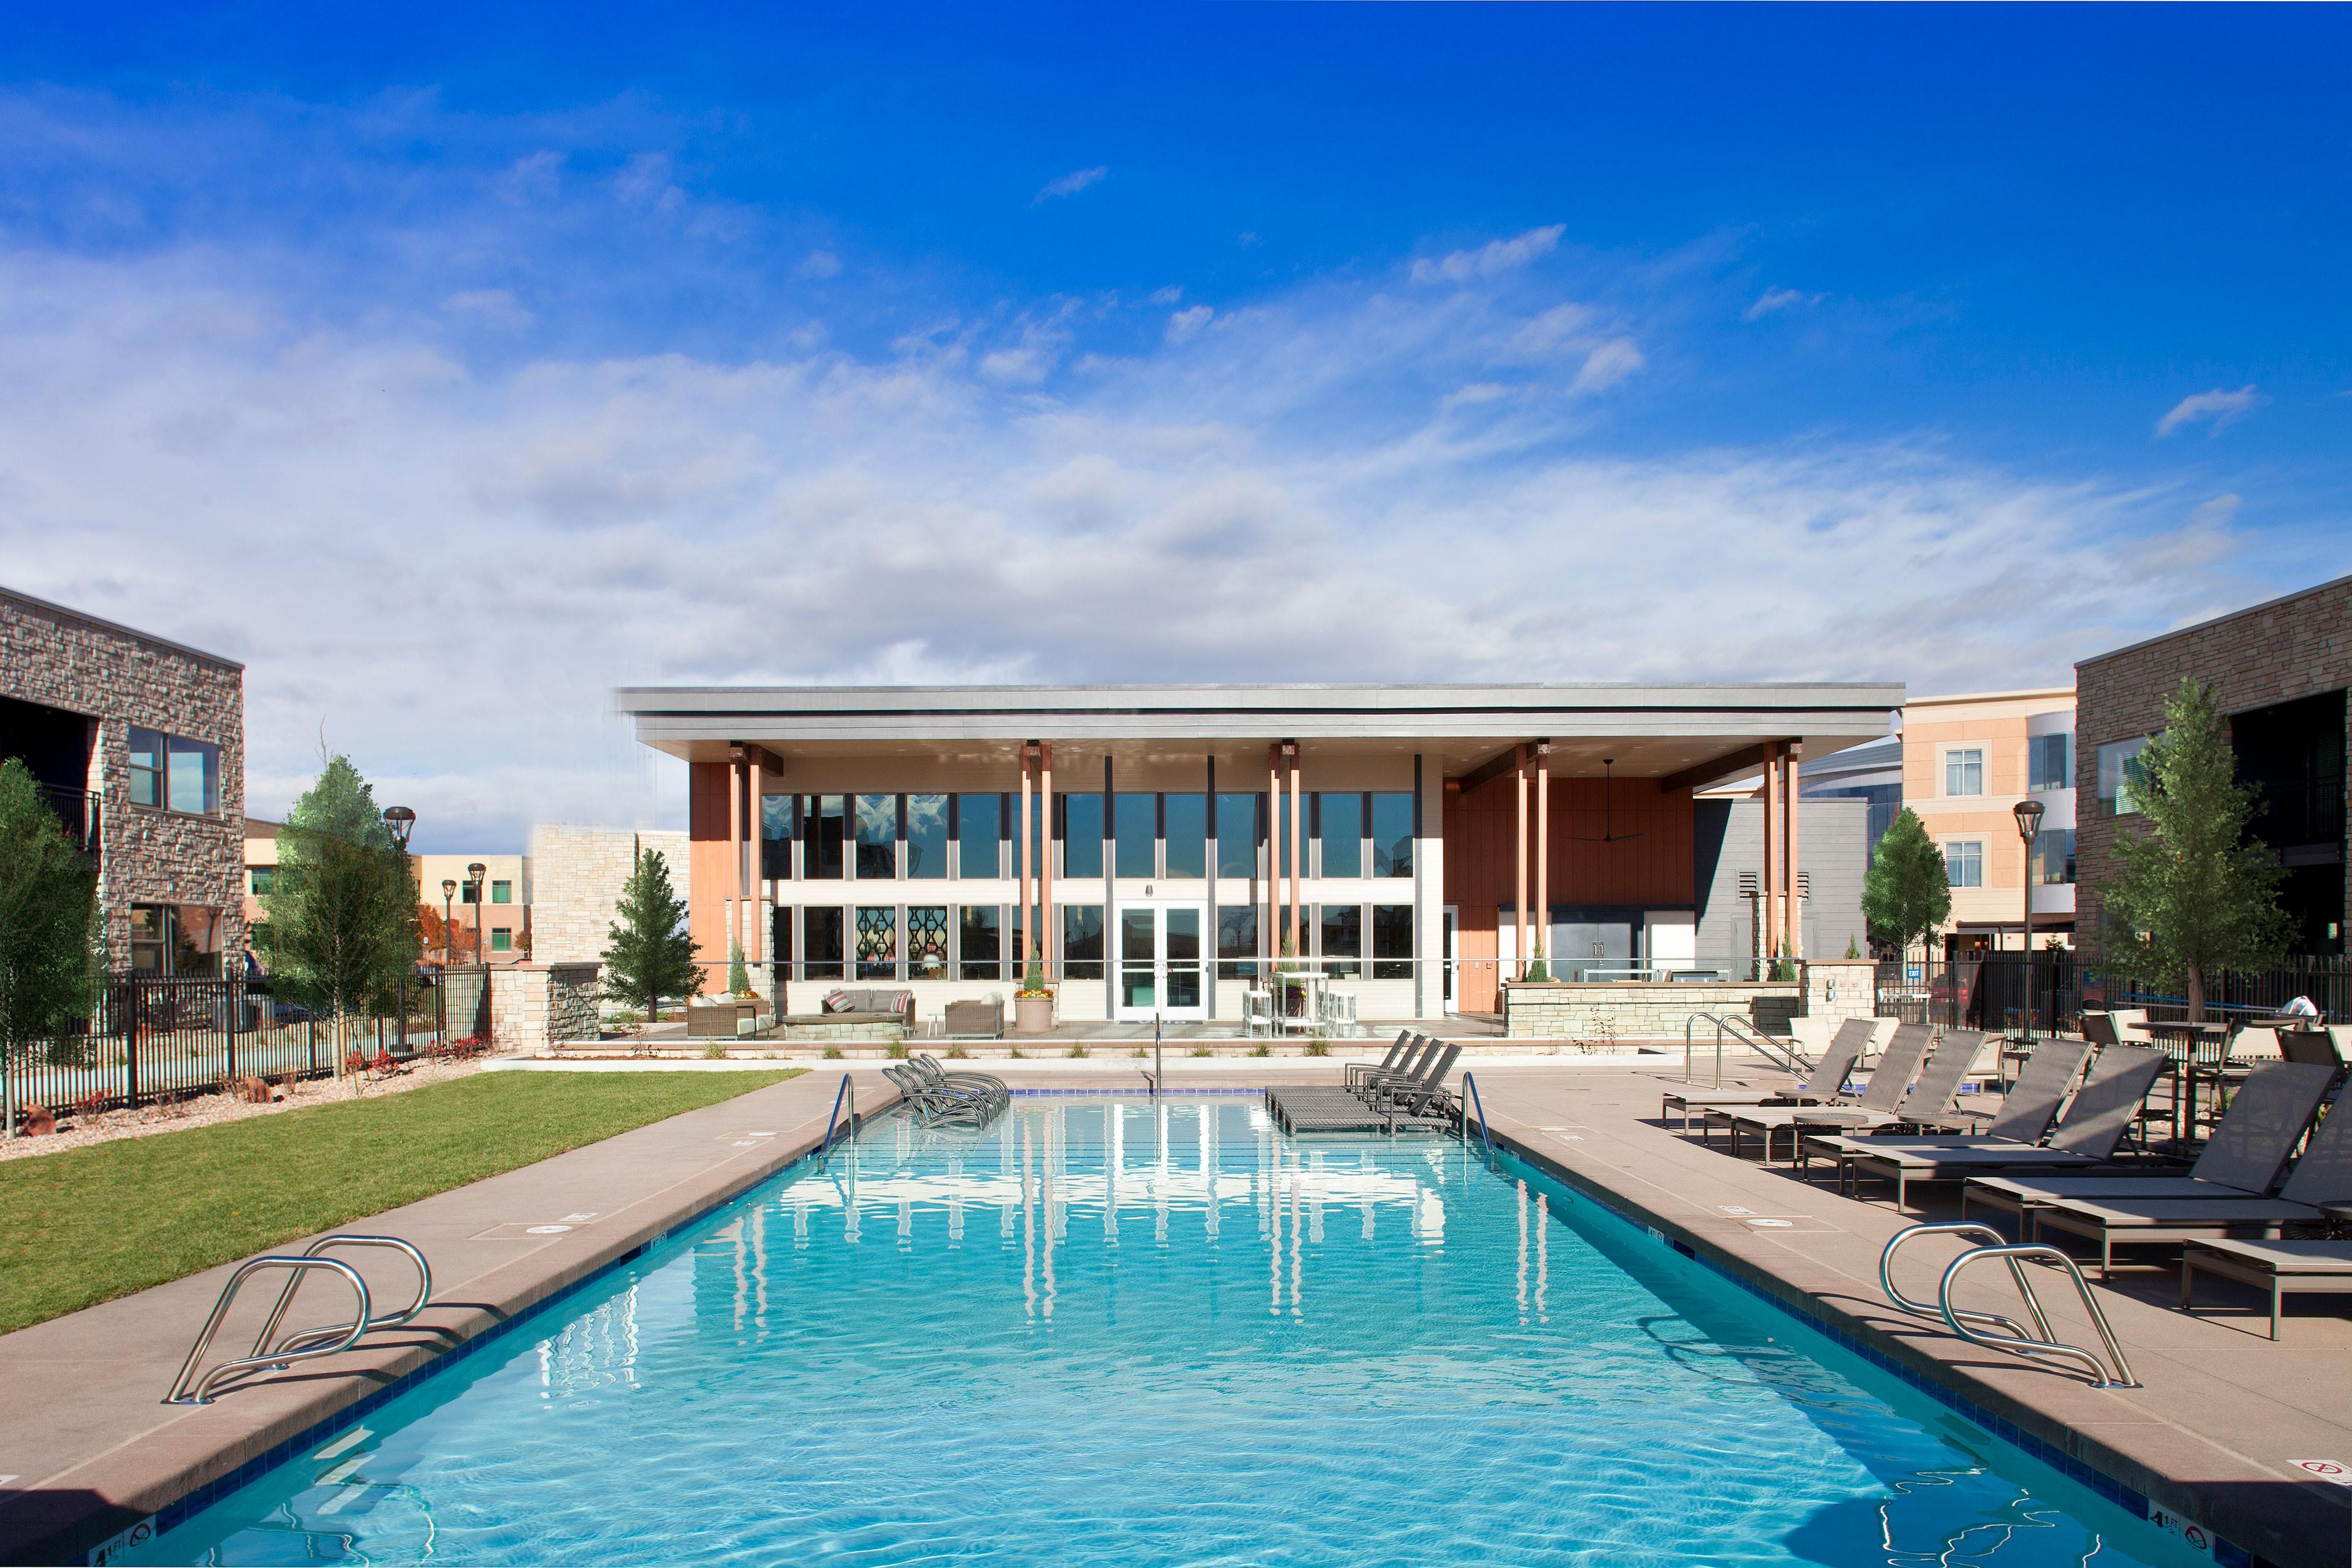 Apartments Near JIU Vela Meridian for Jones International University Students in Centennial, CO